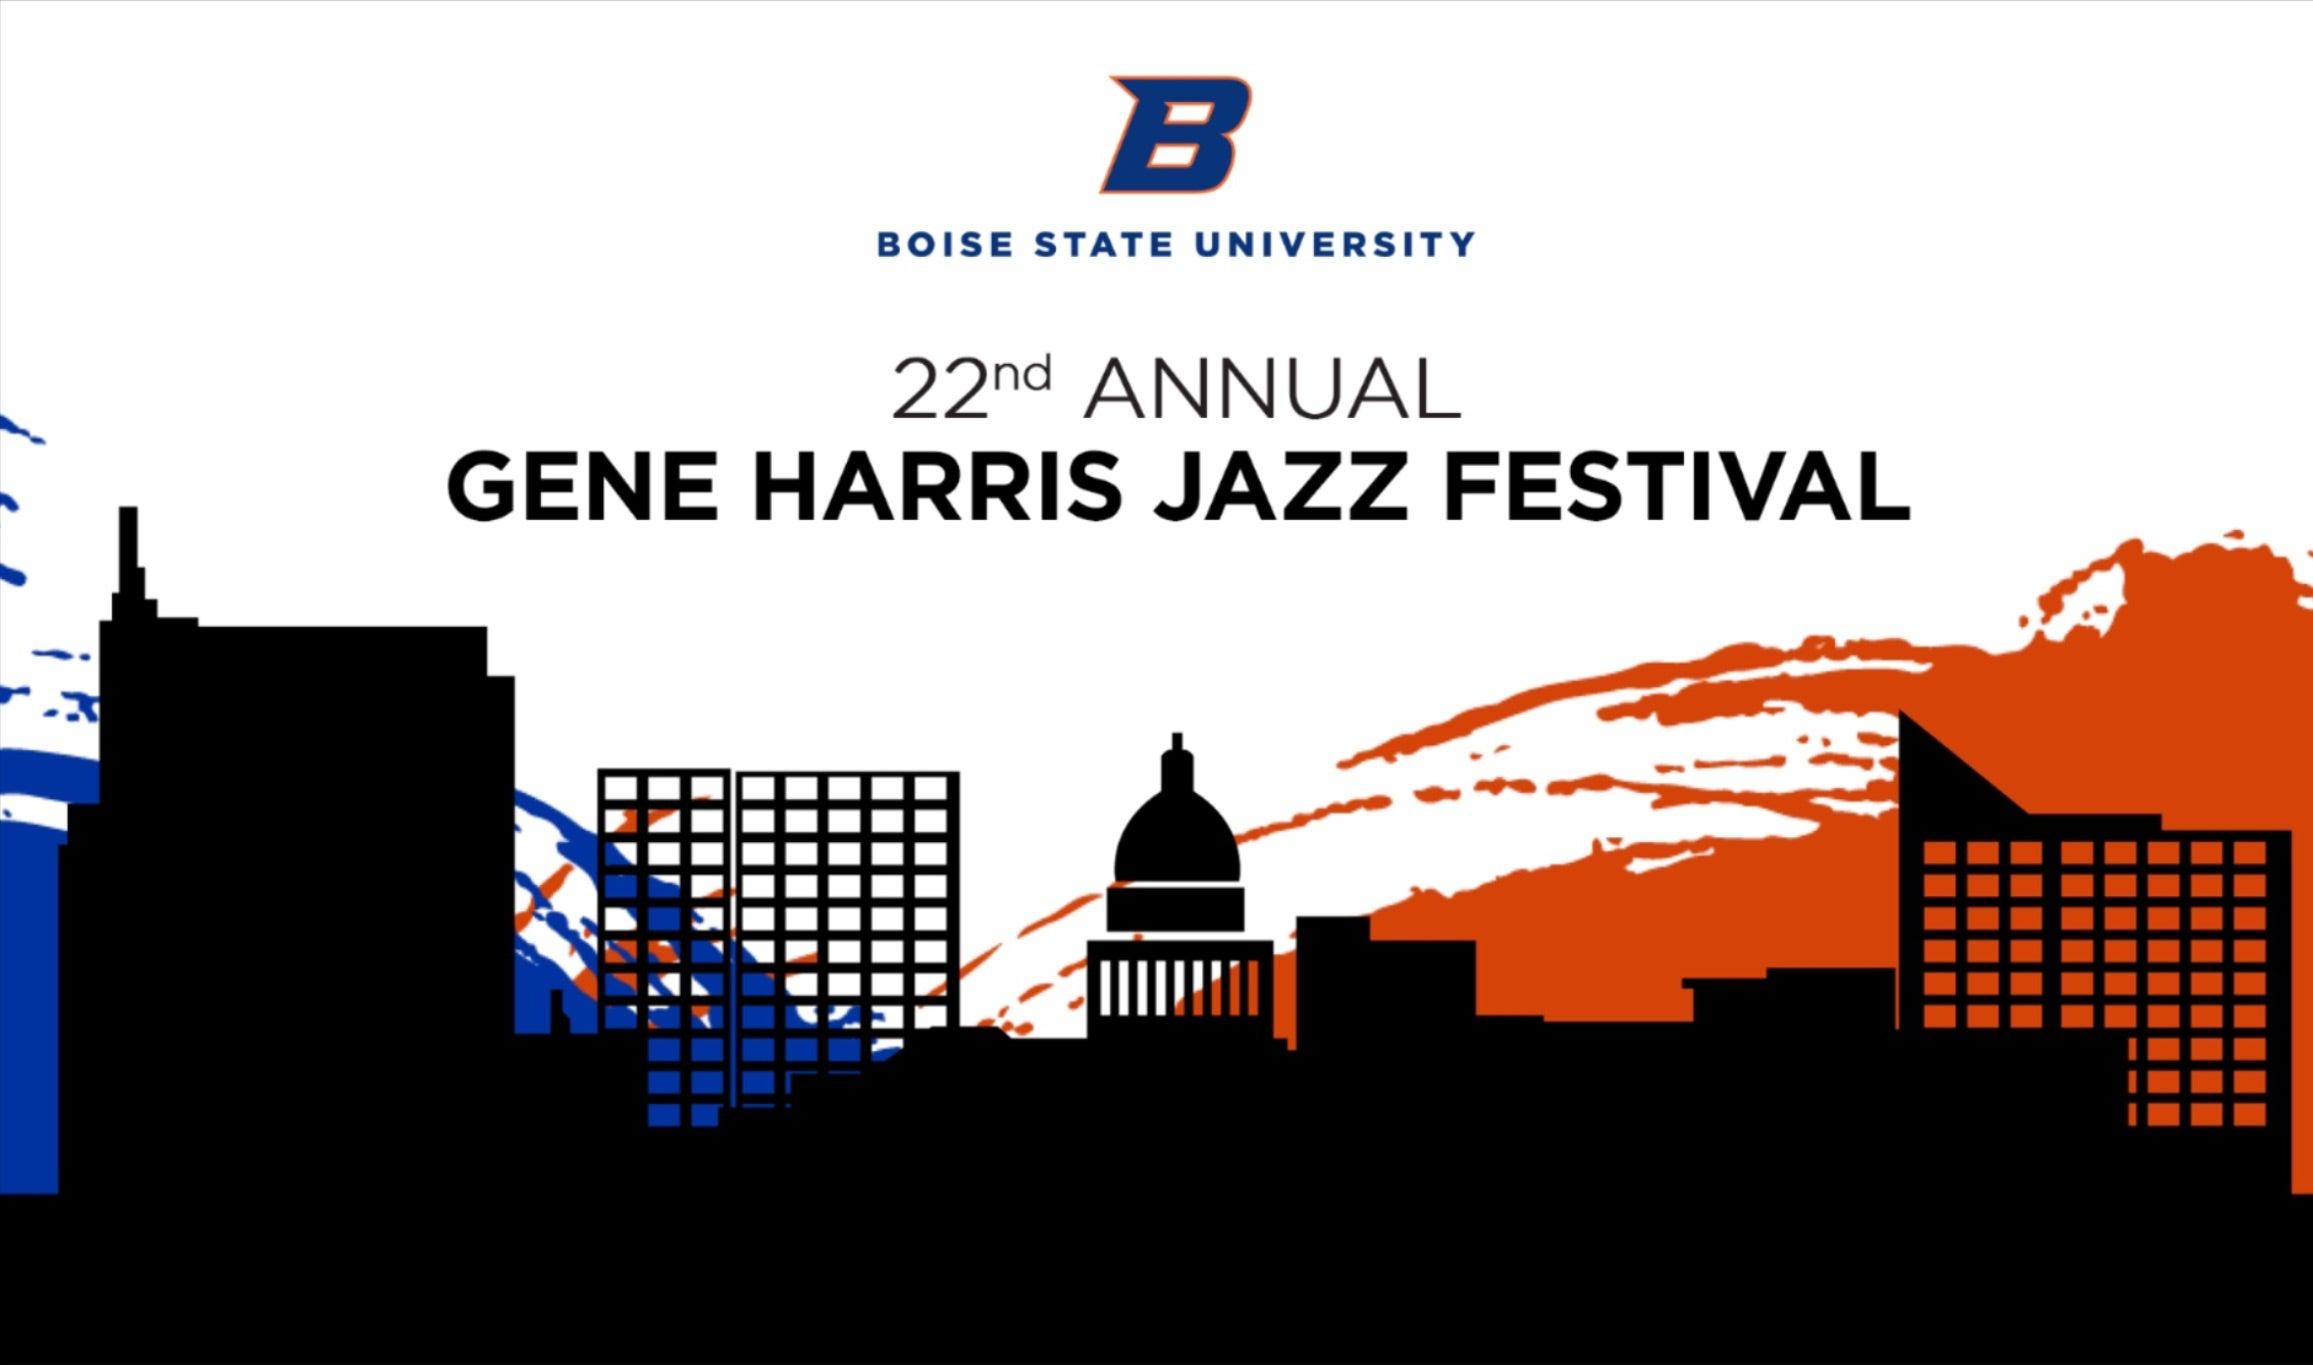 Gene Harris Jazz Festival Event Image